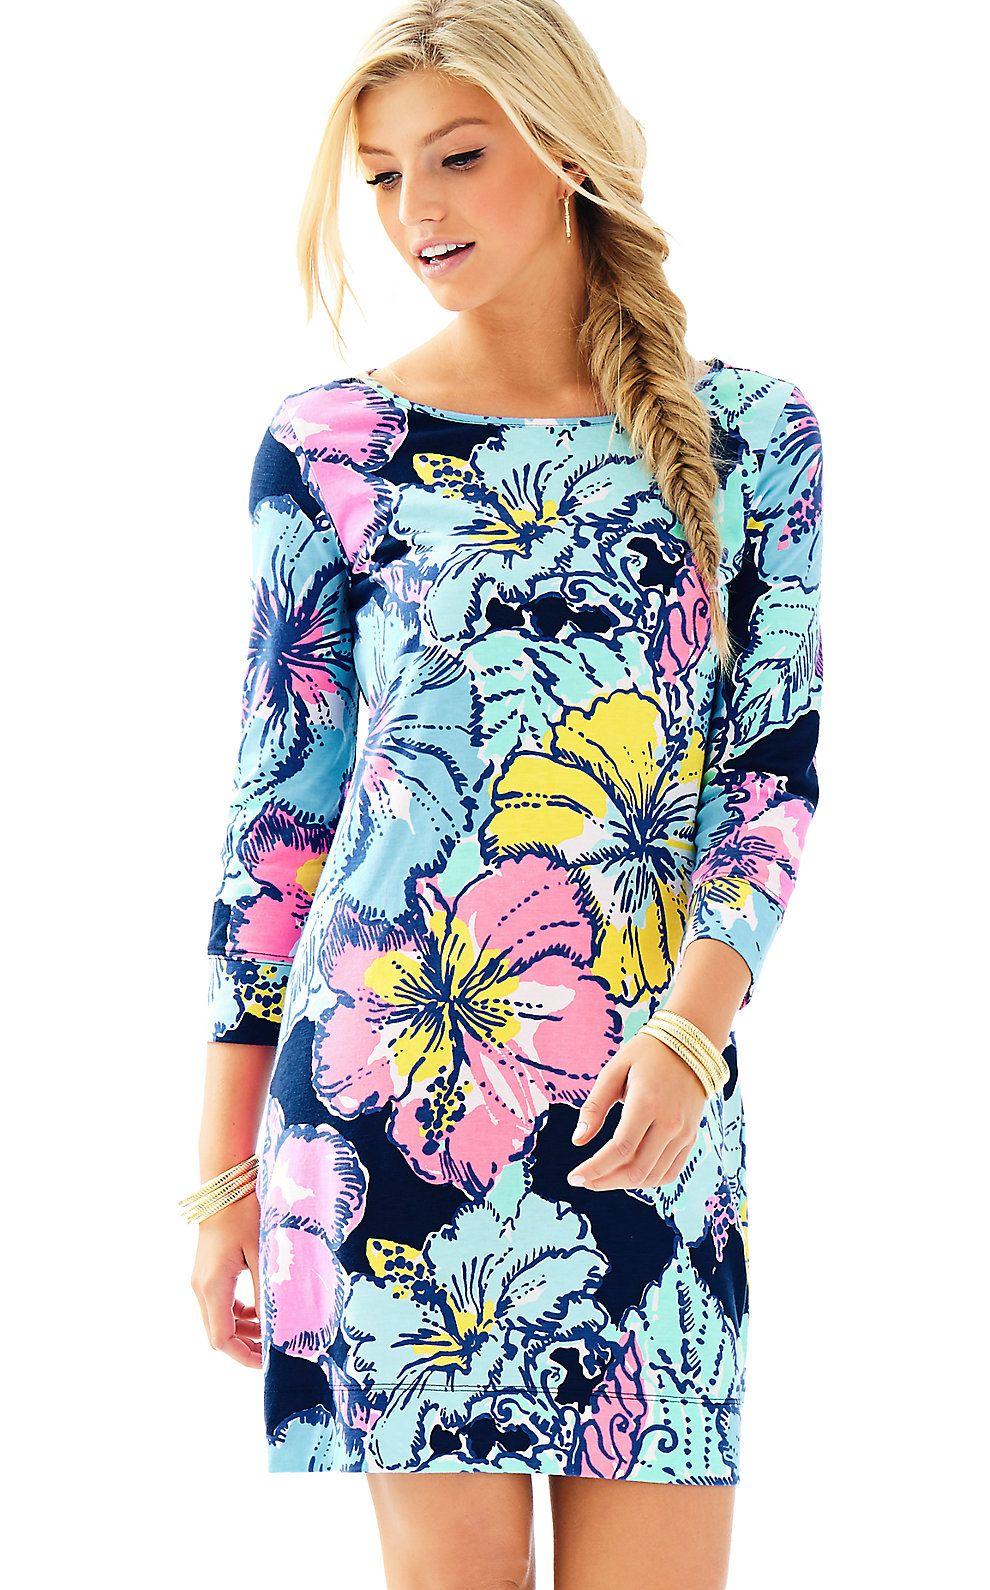 Marlowe Boatneck T Shirt Dress New Arrivals Prints Under 100